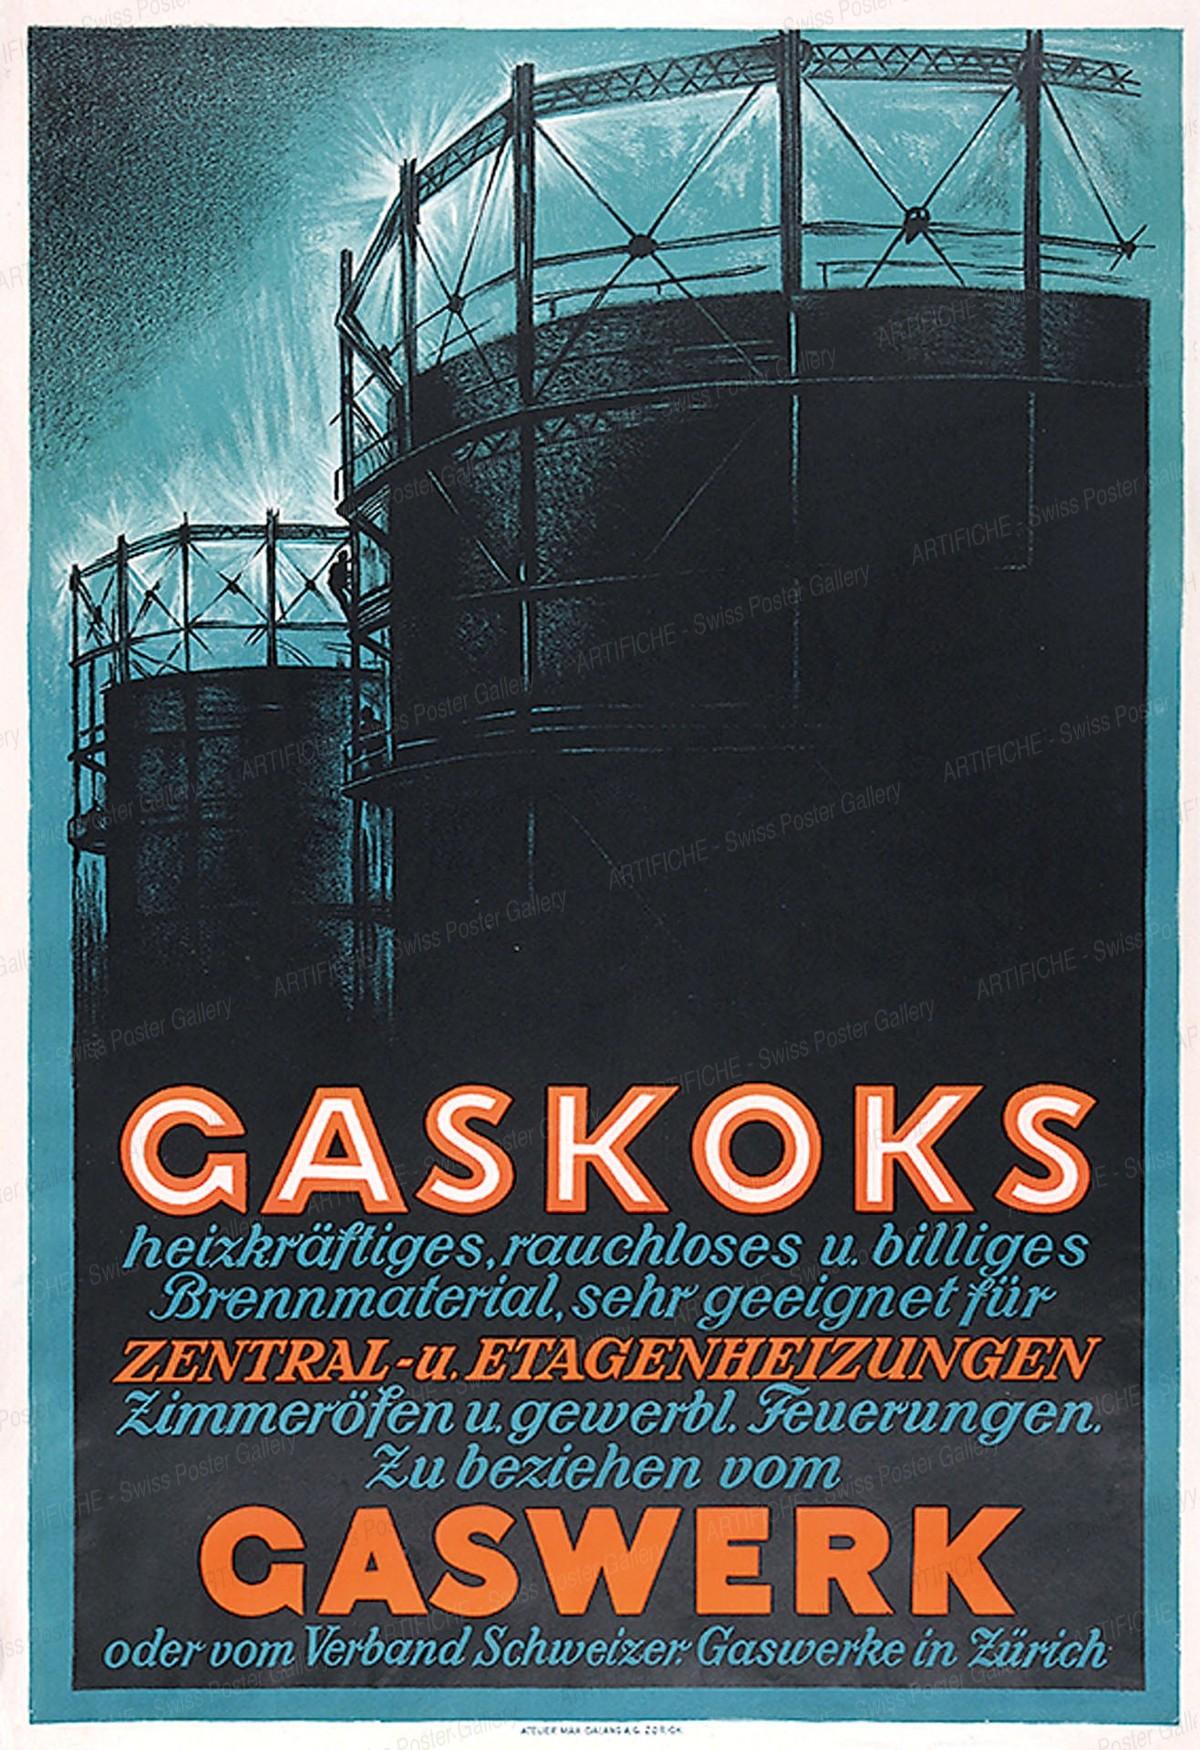 Gaskoks Gaswerk, Max Dalang